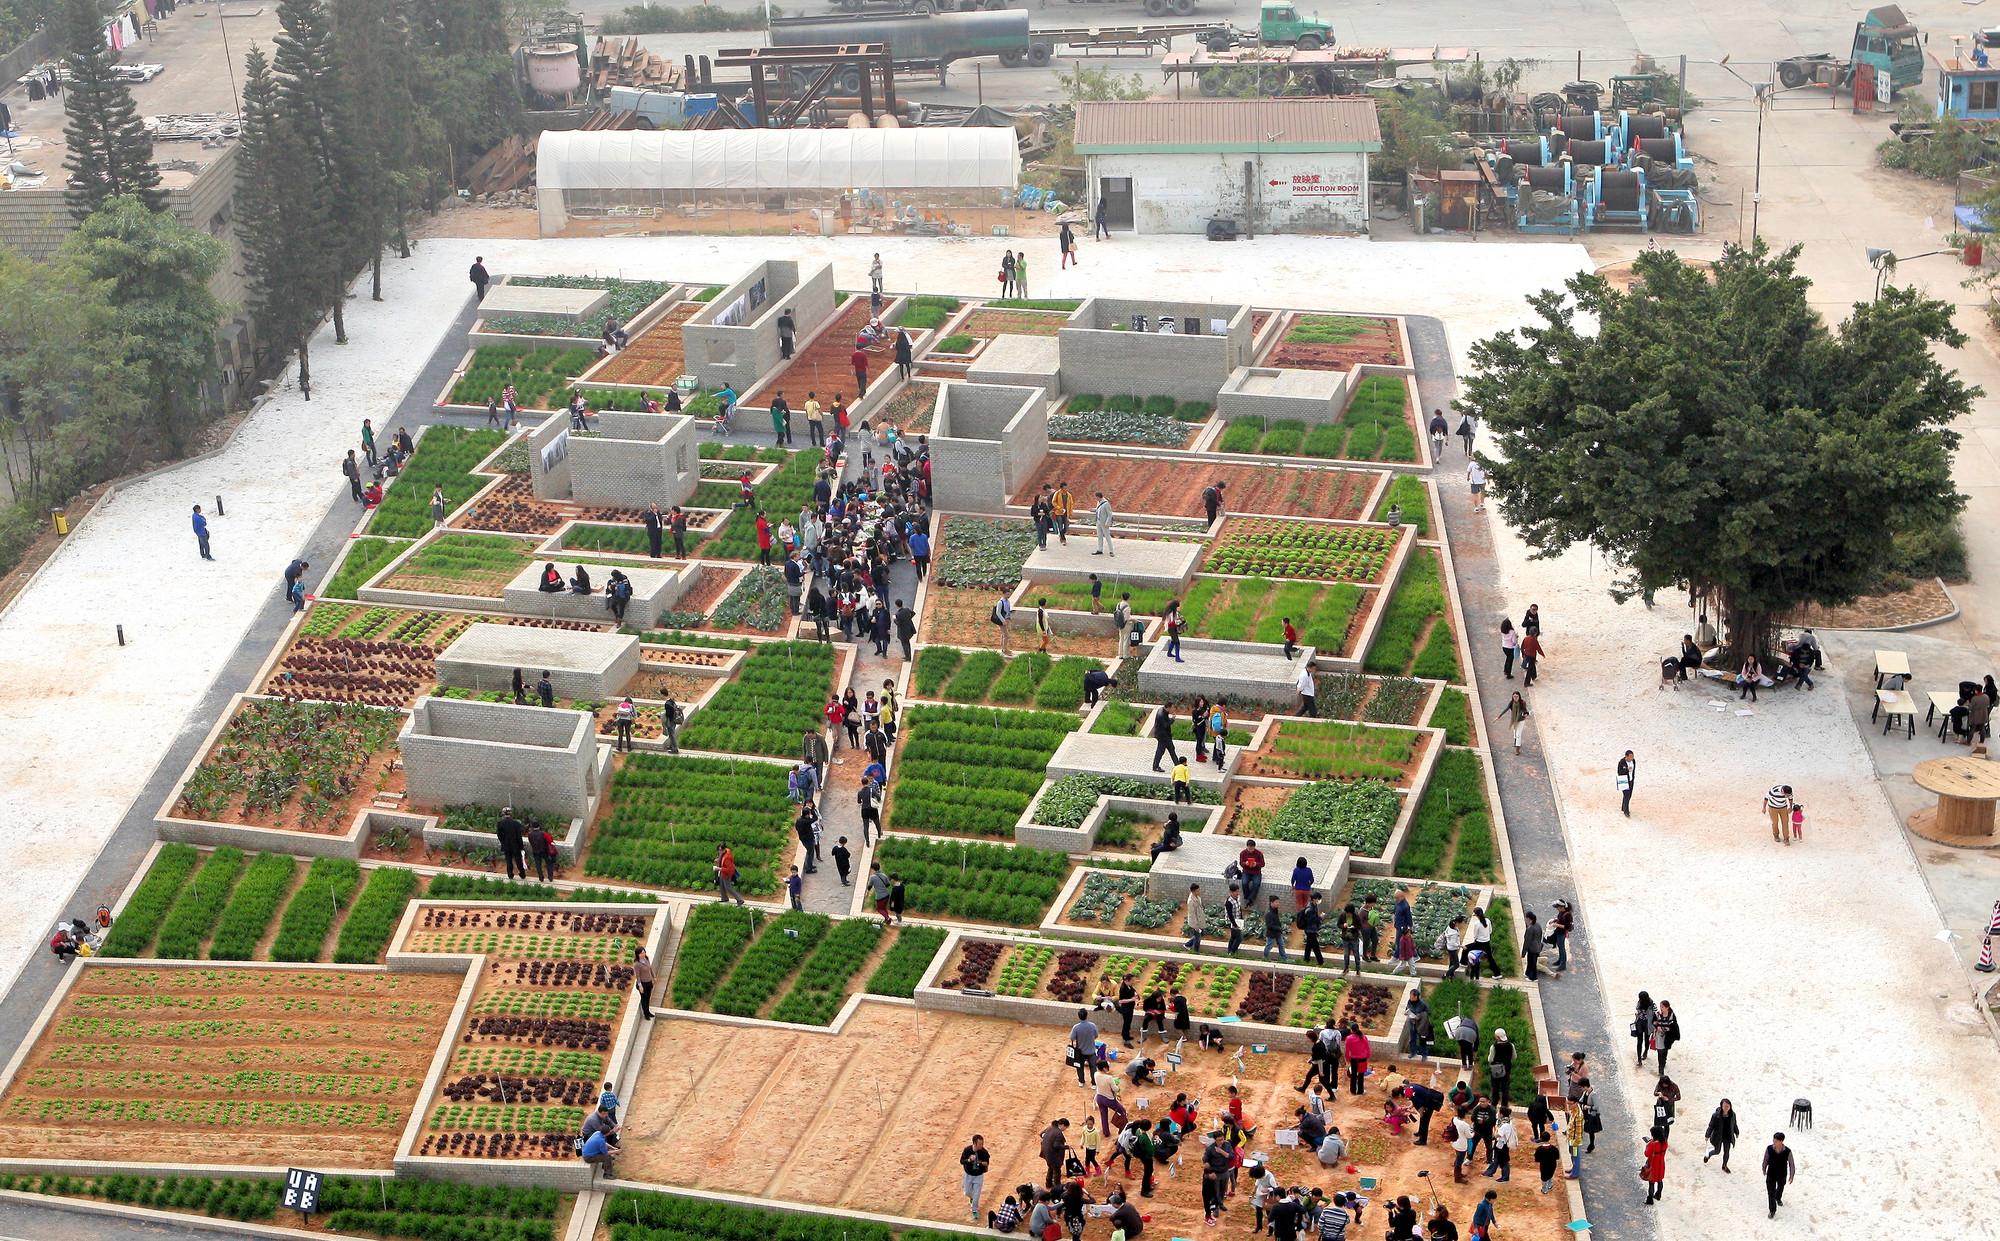 Value Farm